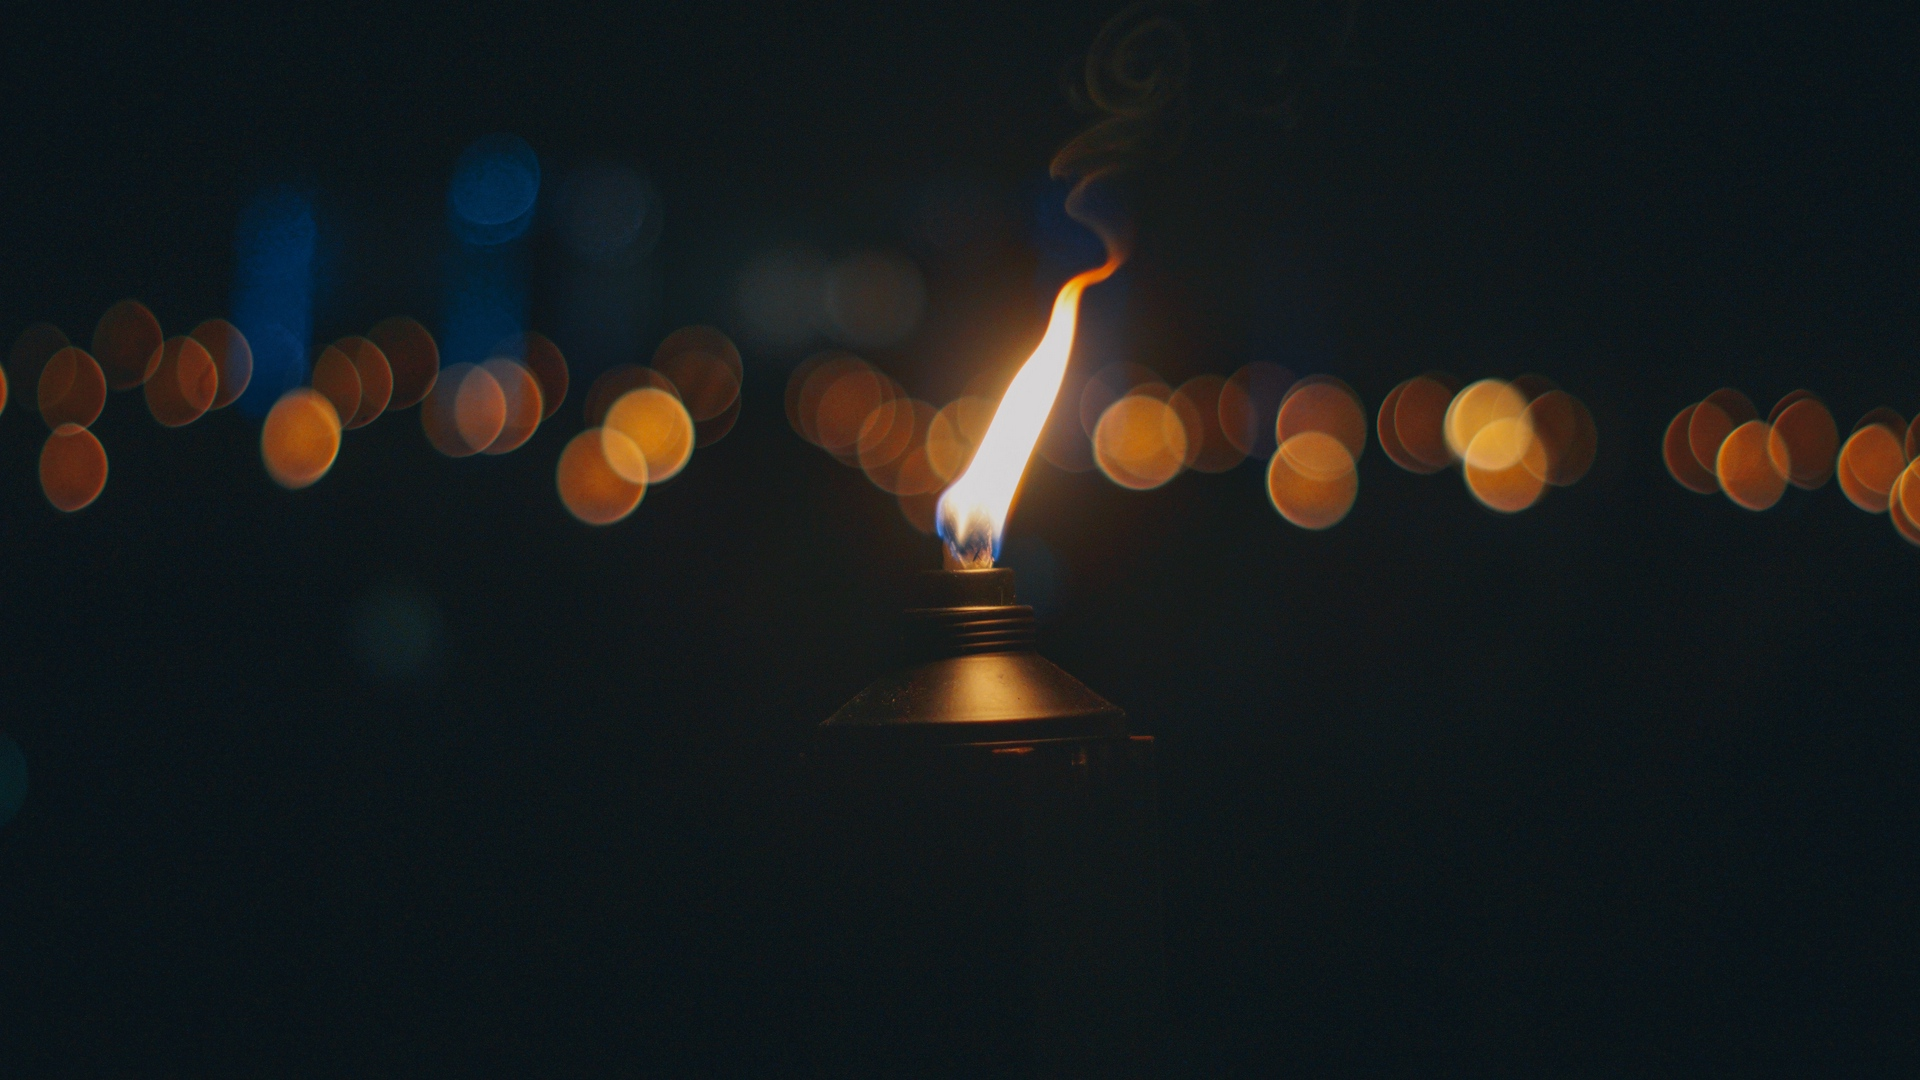 Download wallpaper 1920x1080 torch fire wick glare full hd 1920x1080